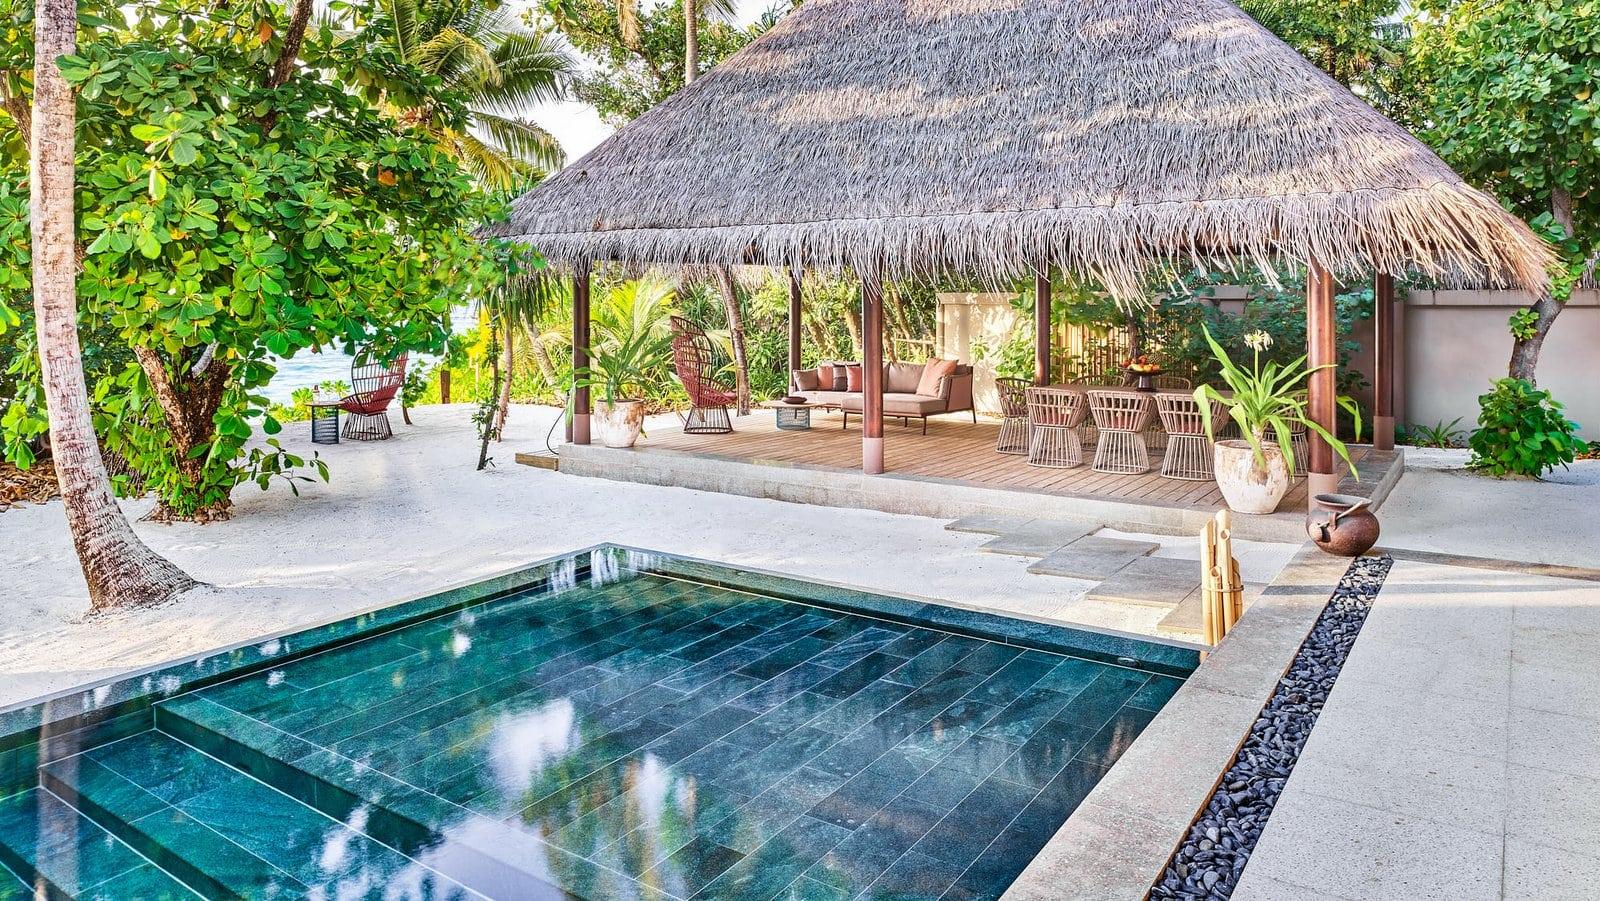 Мальдивы, отель Joali Maldives, номер Four Bed Room Beach Residence with Pool